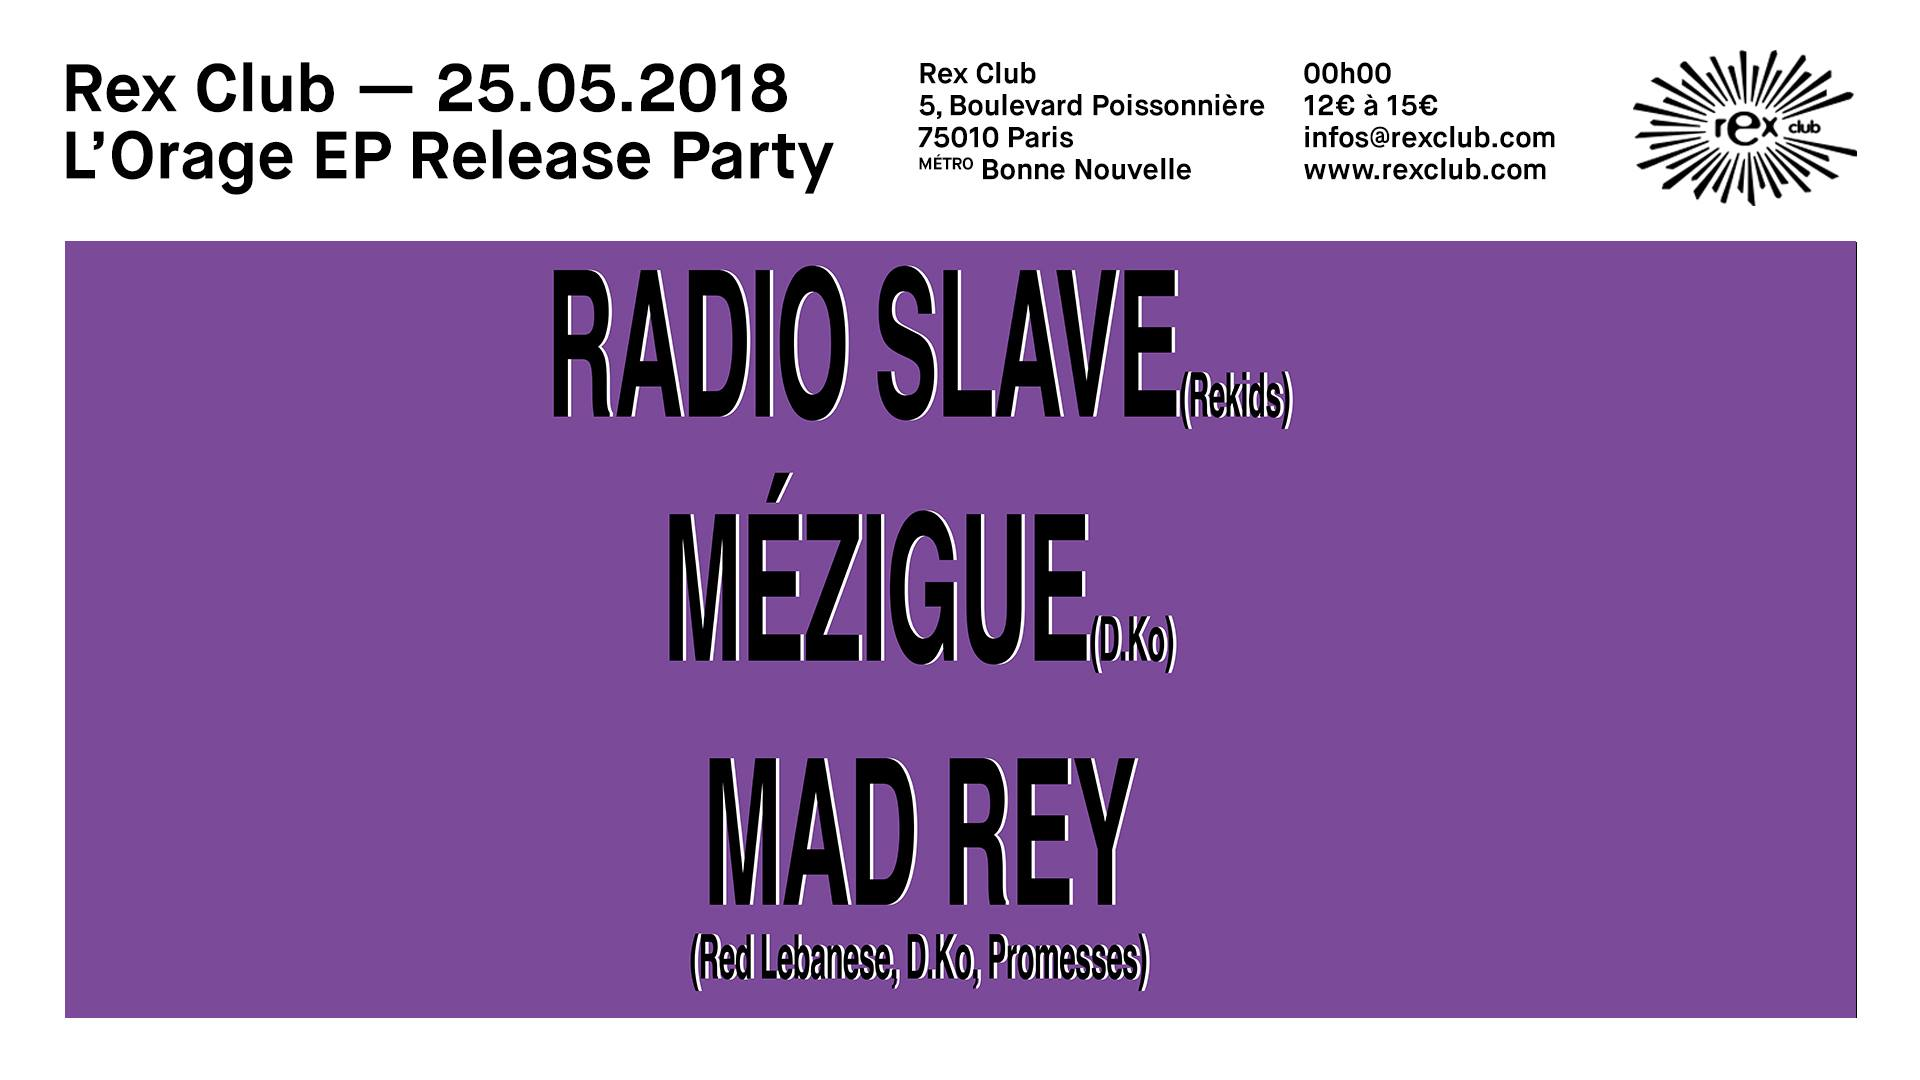 Mad Rey Release Party: Radio Slave Mad Rey Mézigue